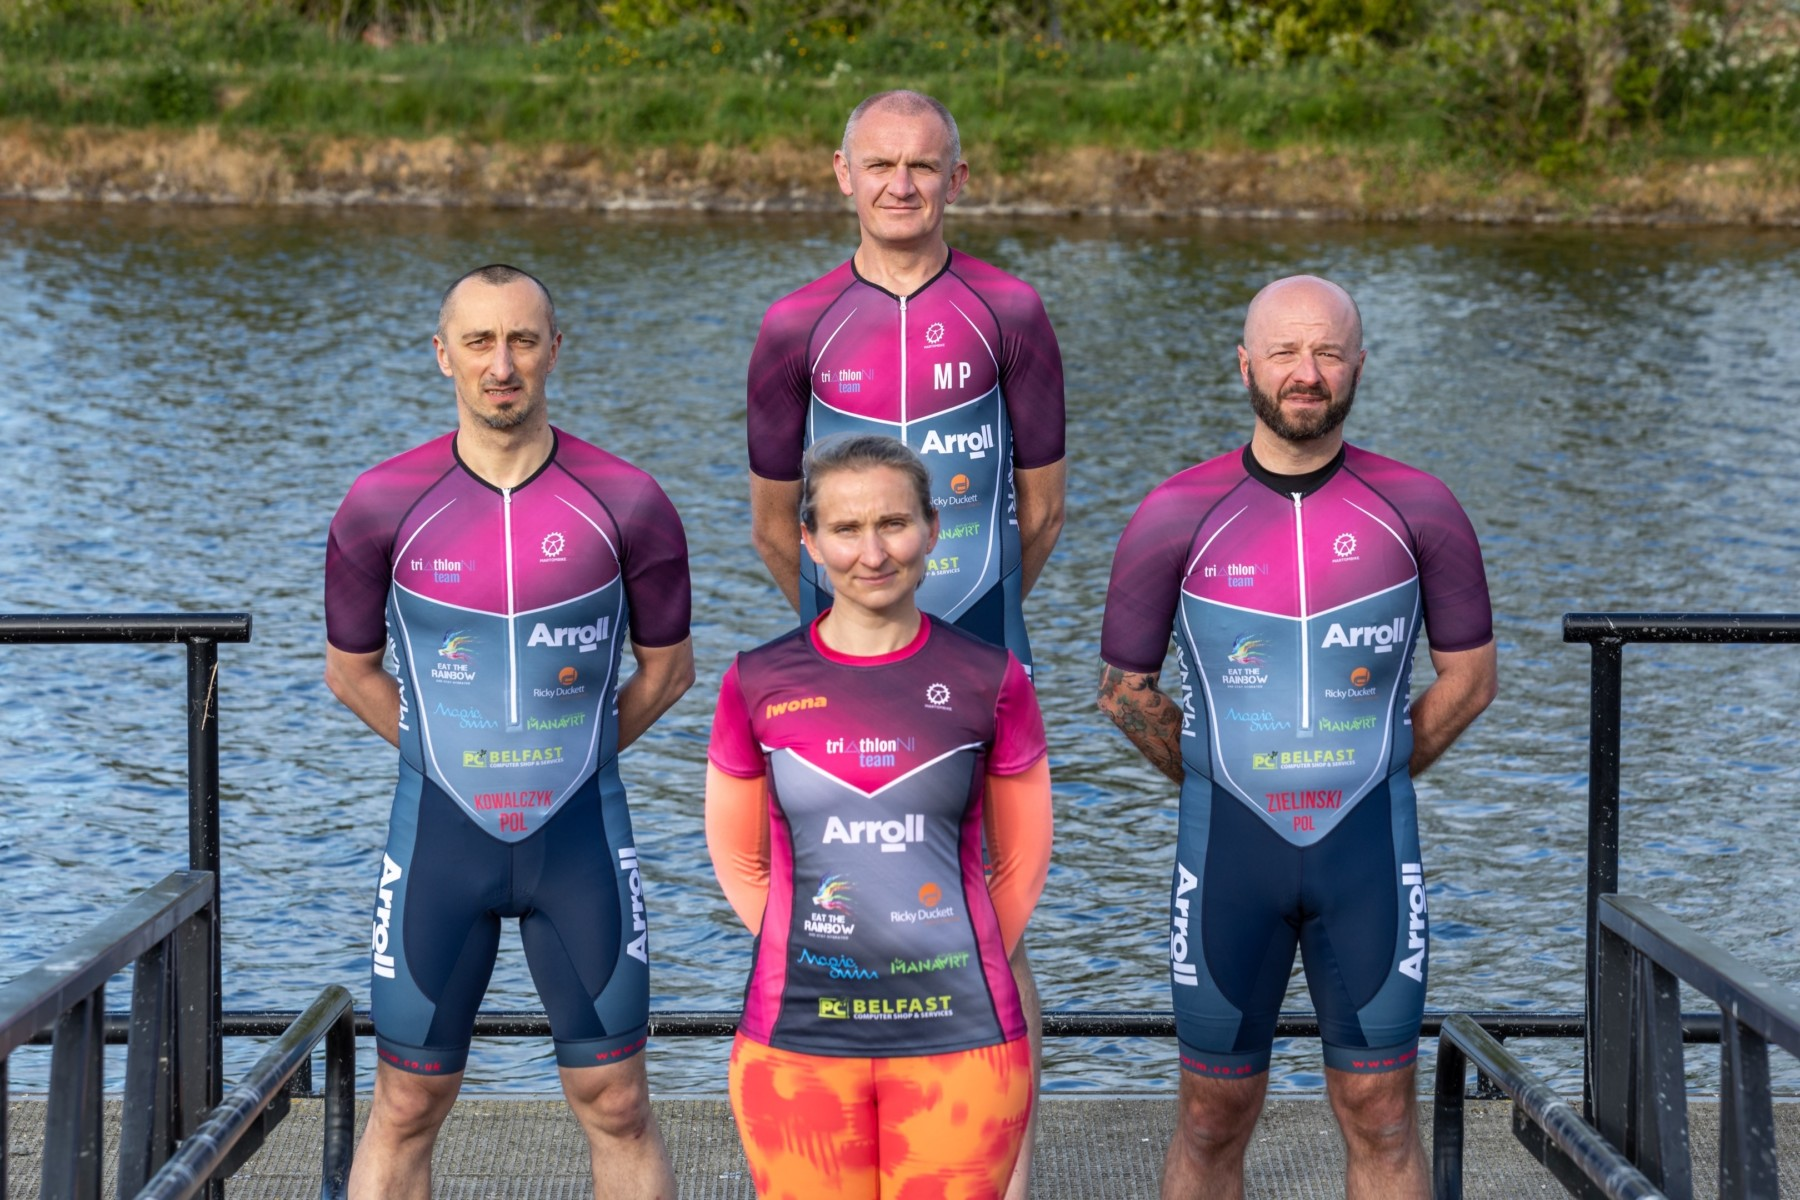 TriathlonNI Team photo: Maciek Bator